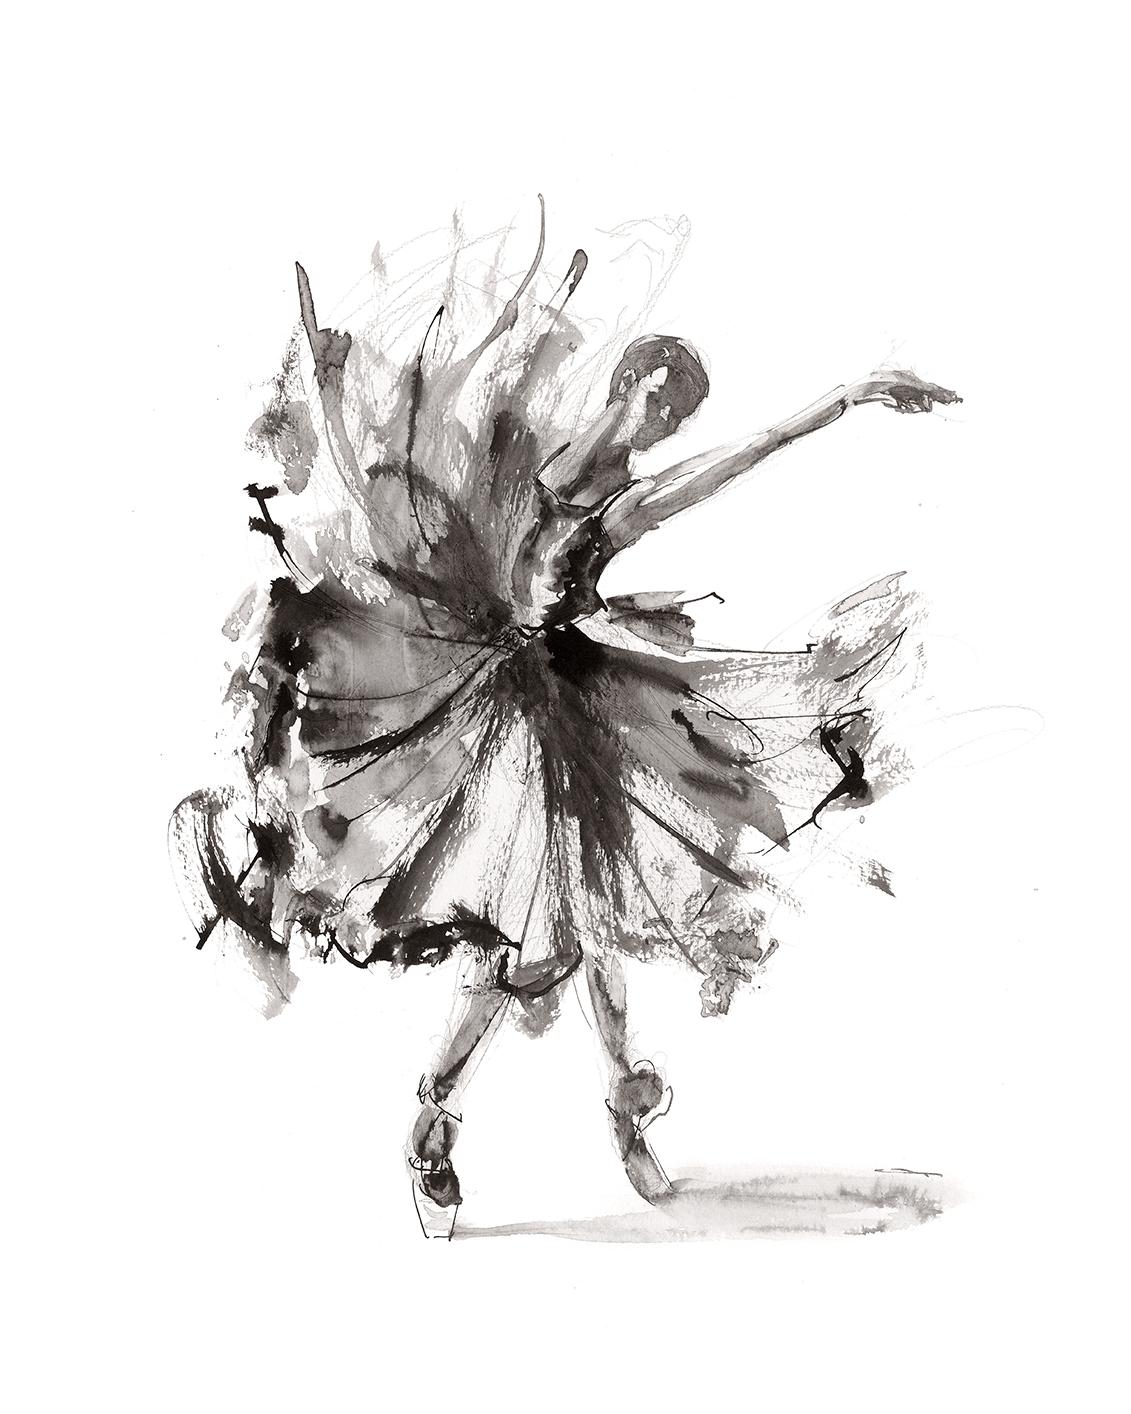 'Release'.  Fine Art Print by Artist, Dana Trijbetz.  Ballet Dancers Collection.  Original Ink Painting made as a Giclée Print on 100% Cotton Paper.  Image 2 of 3.jpg